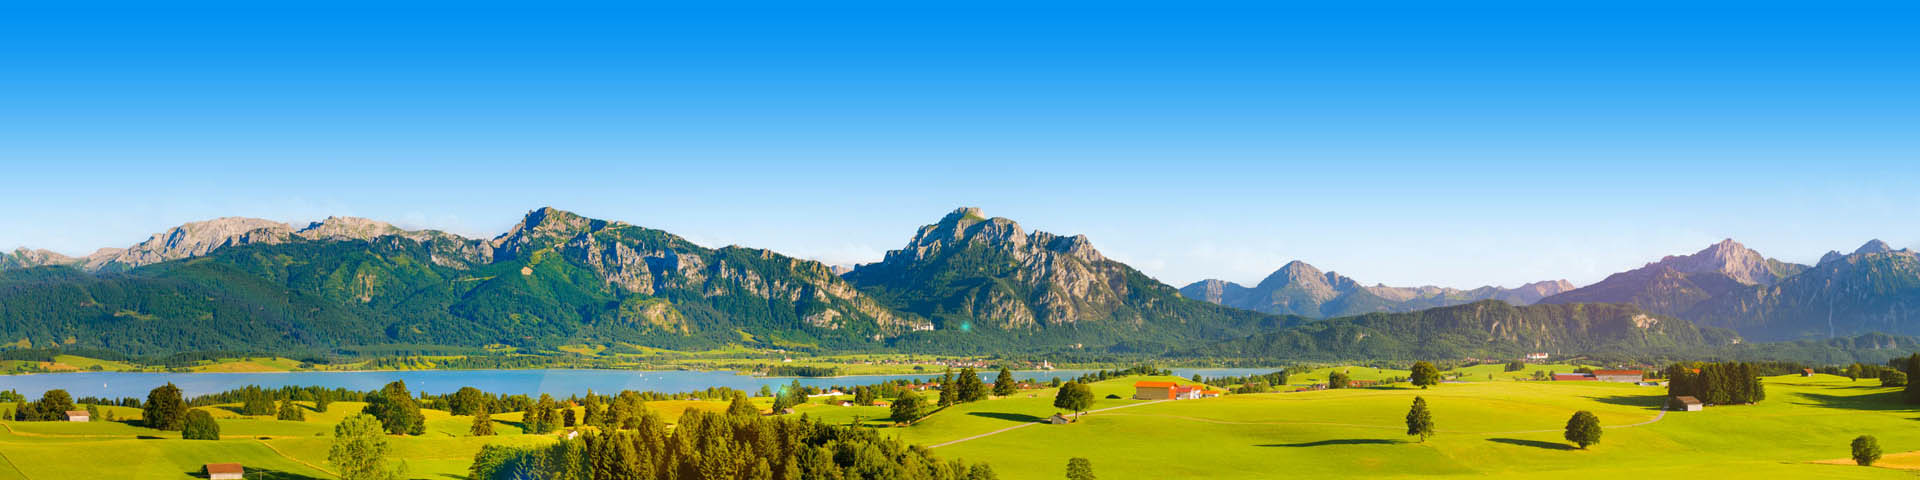 Prachtige omgeving en groene natuur in Duitsland